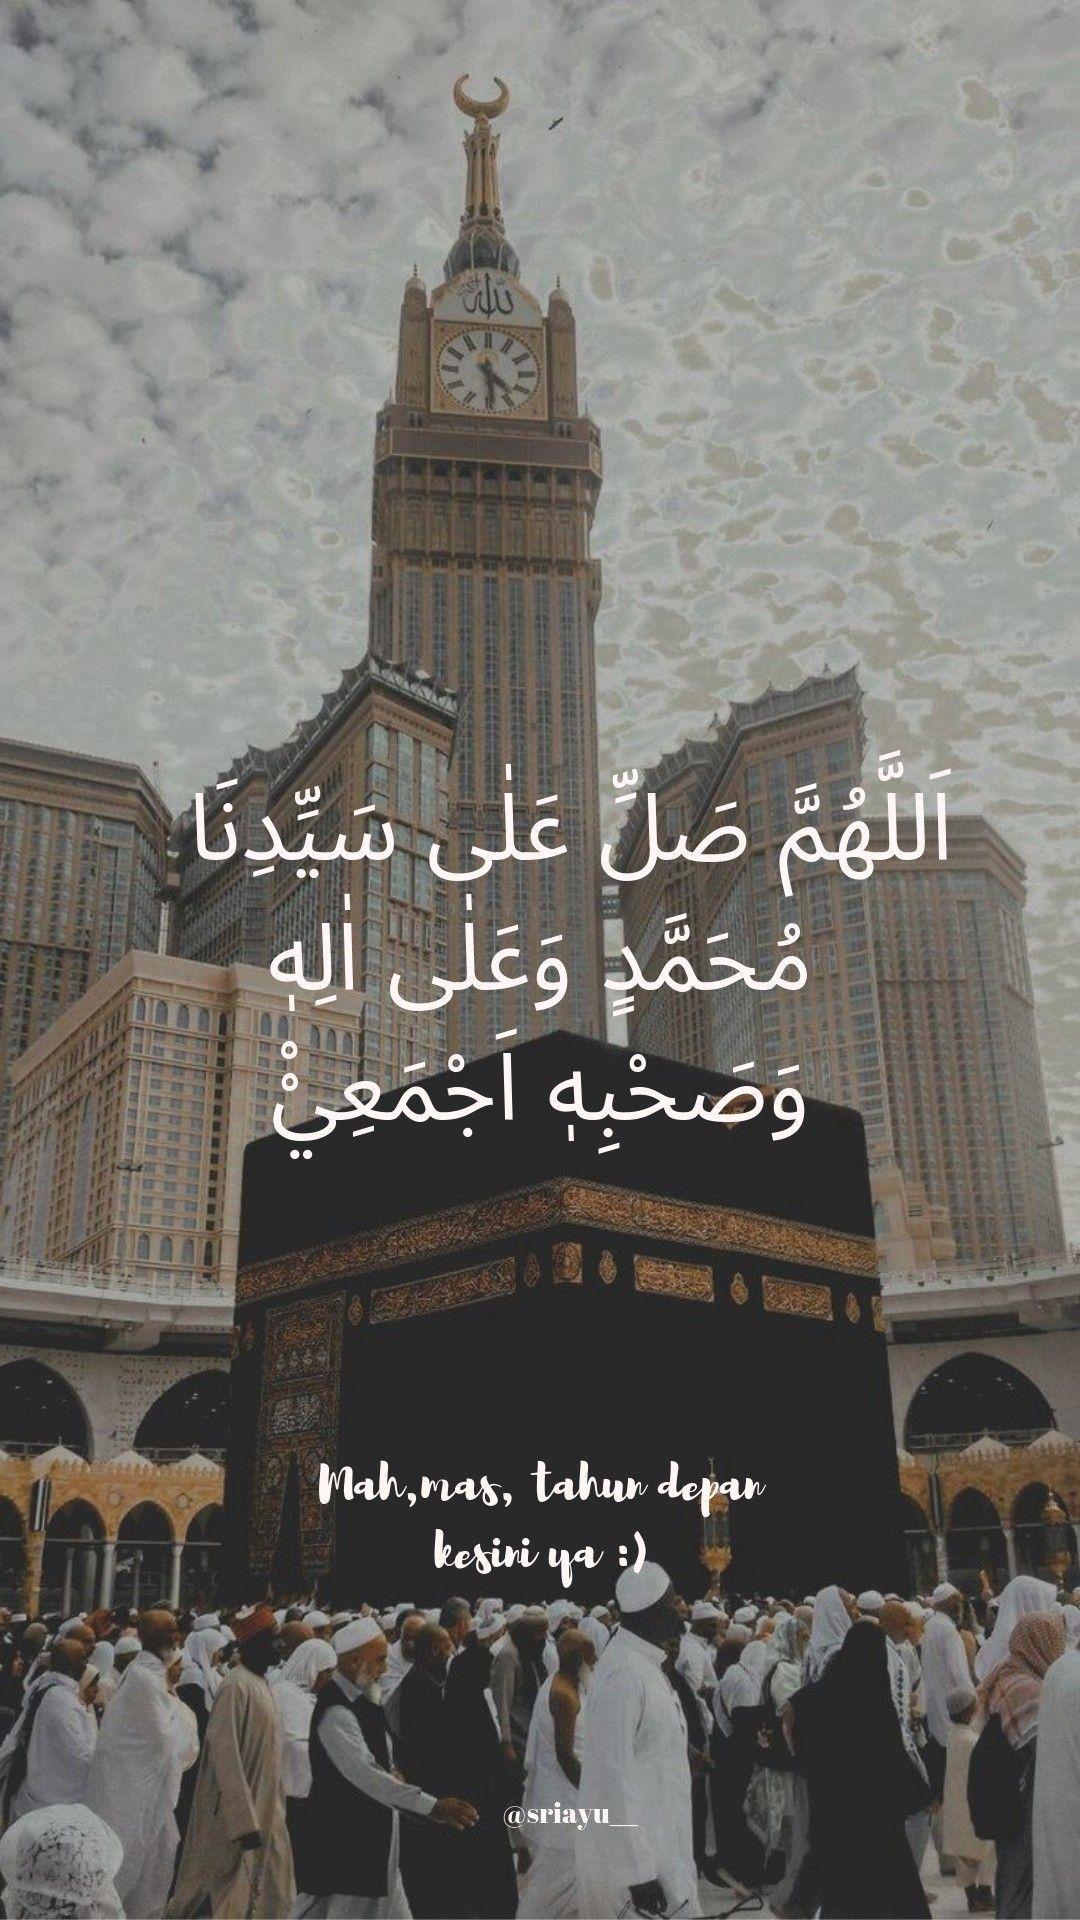 Allahumma Sholli Ala Sayyidina Muhammad Wa Ala Ali Sayyidina Muhammad Artinya : allahumma, sholli, sayyidina, muhammad, artinya, Akuumroh, #shalawat, #ka'bah, Quran, Quotes, Inspirational,, Inspirational, Wallpapers,, Islamic